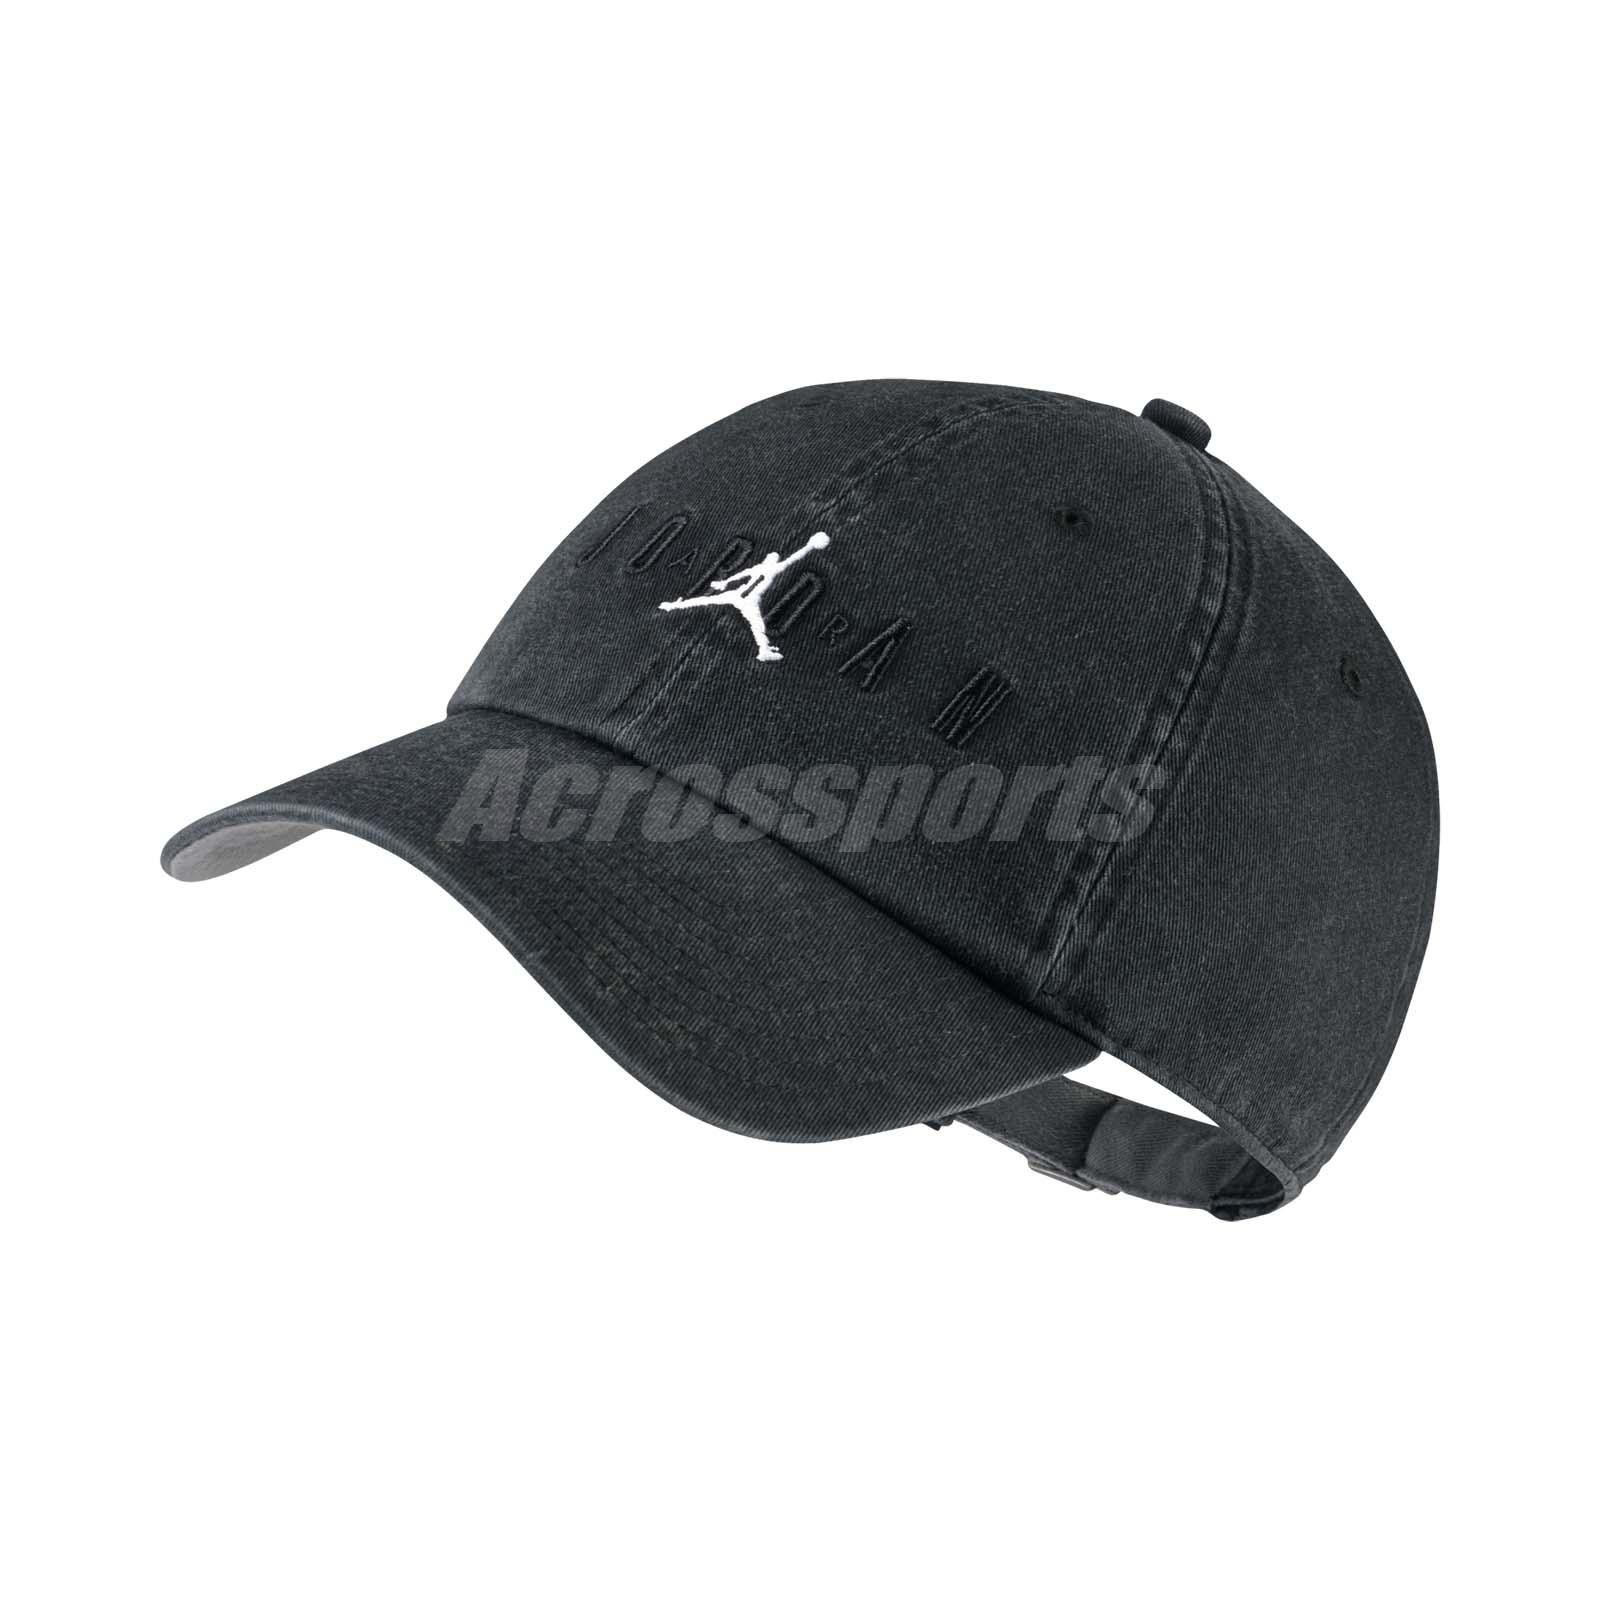 9970642fd7c55 Details about Nike Jordan Heritage 86 Jumpman Air Cap H86 Hat Sports Washed  Black AA1306-010